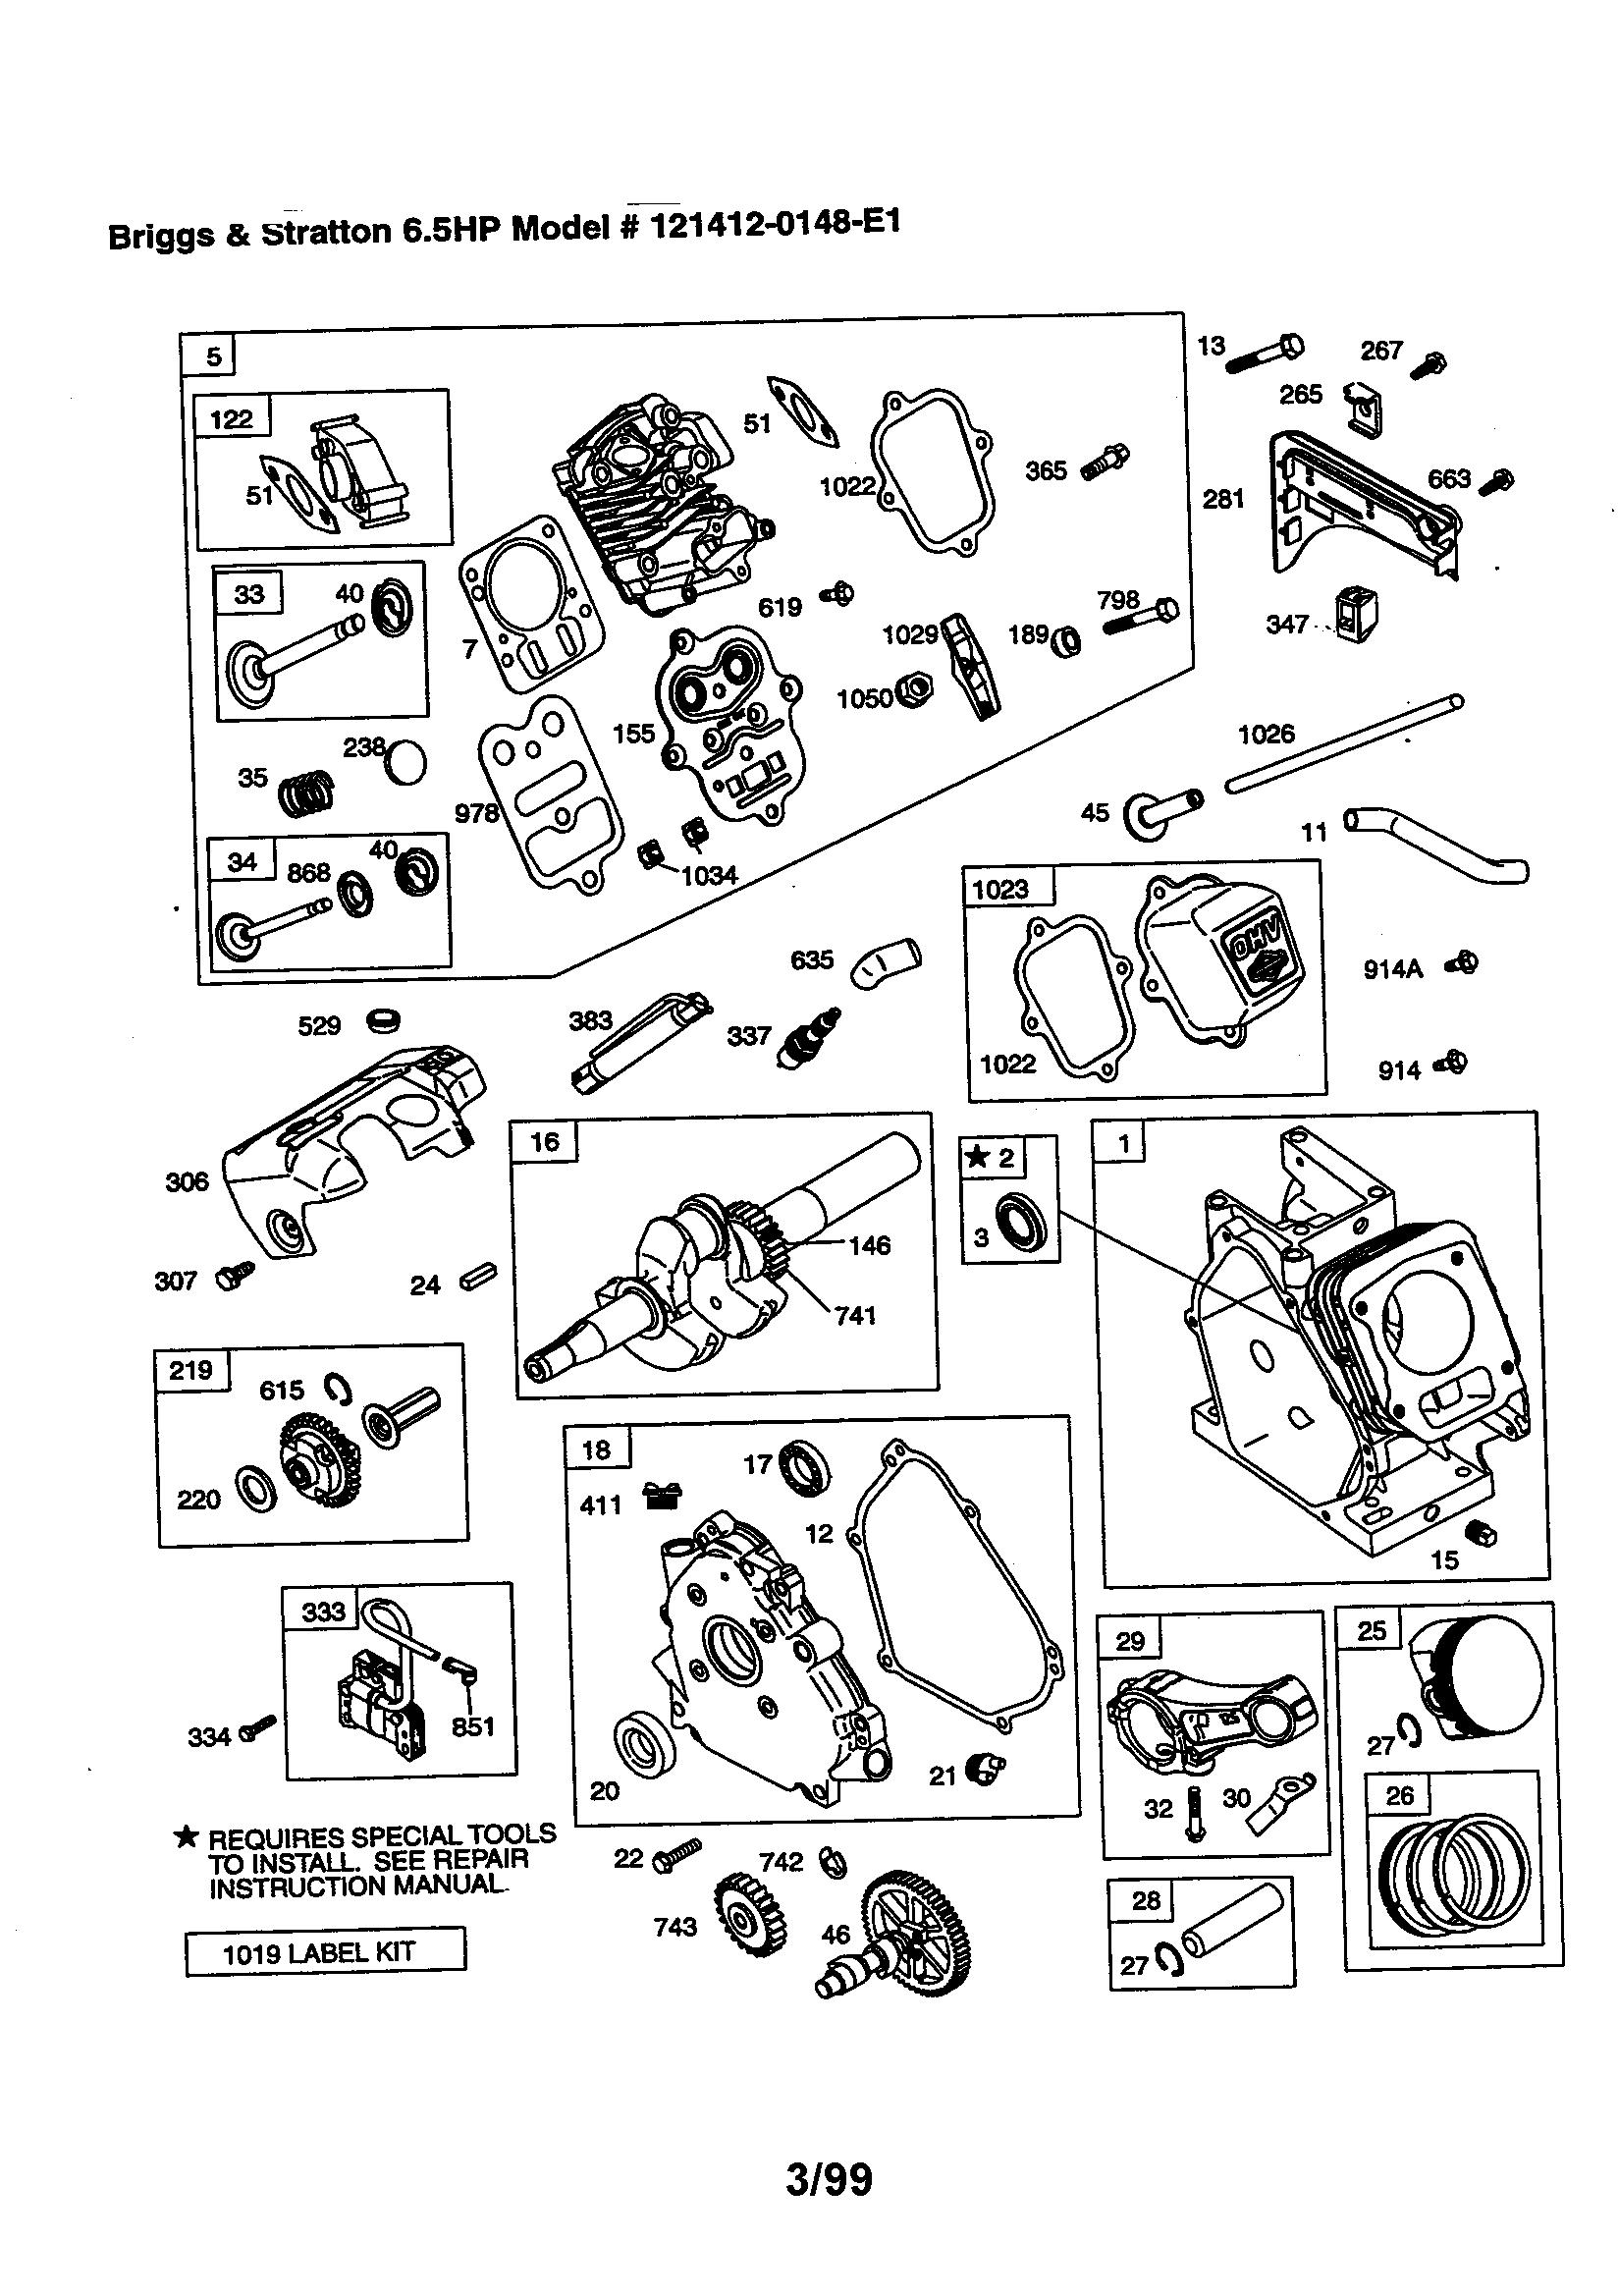 5Hp Briggs And Stratton Carburetor Diagram 21 Hp Briggs And Stratton Wiring Diagram Wiring Library